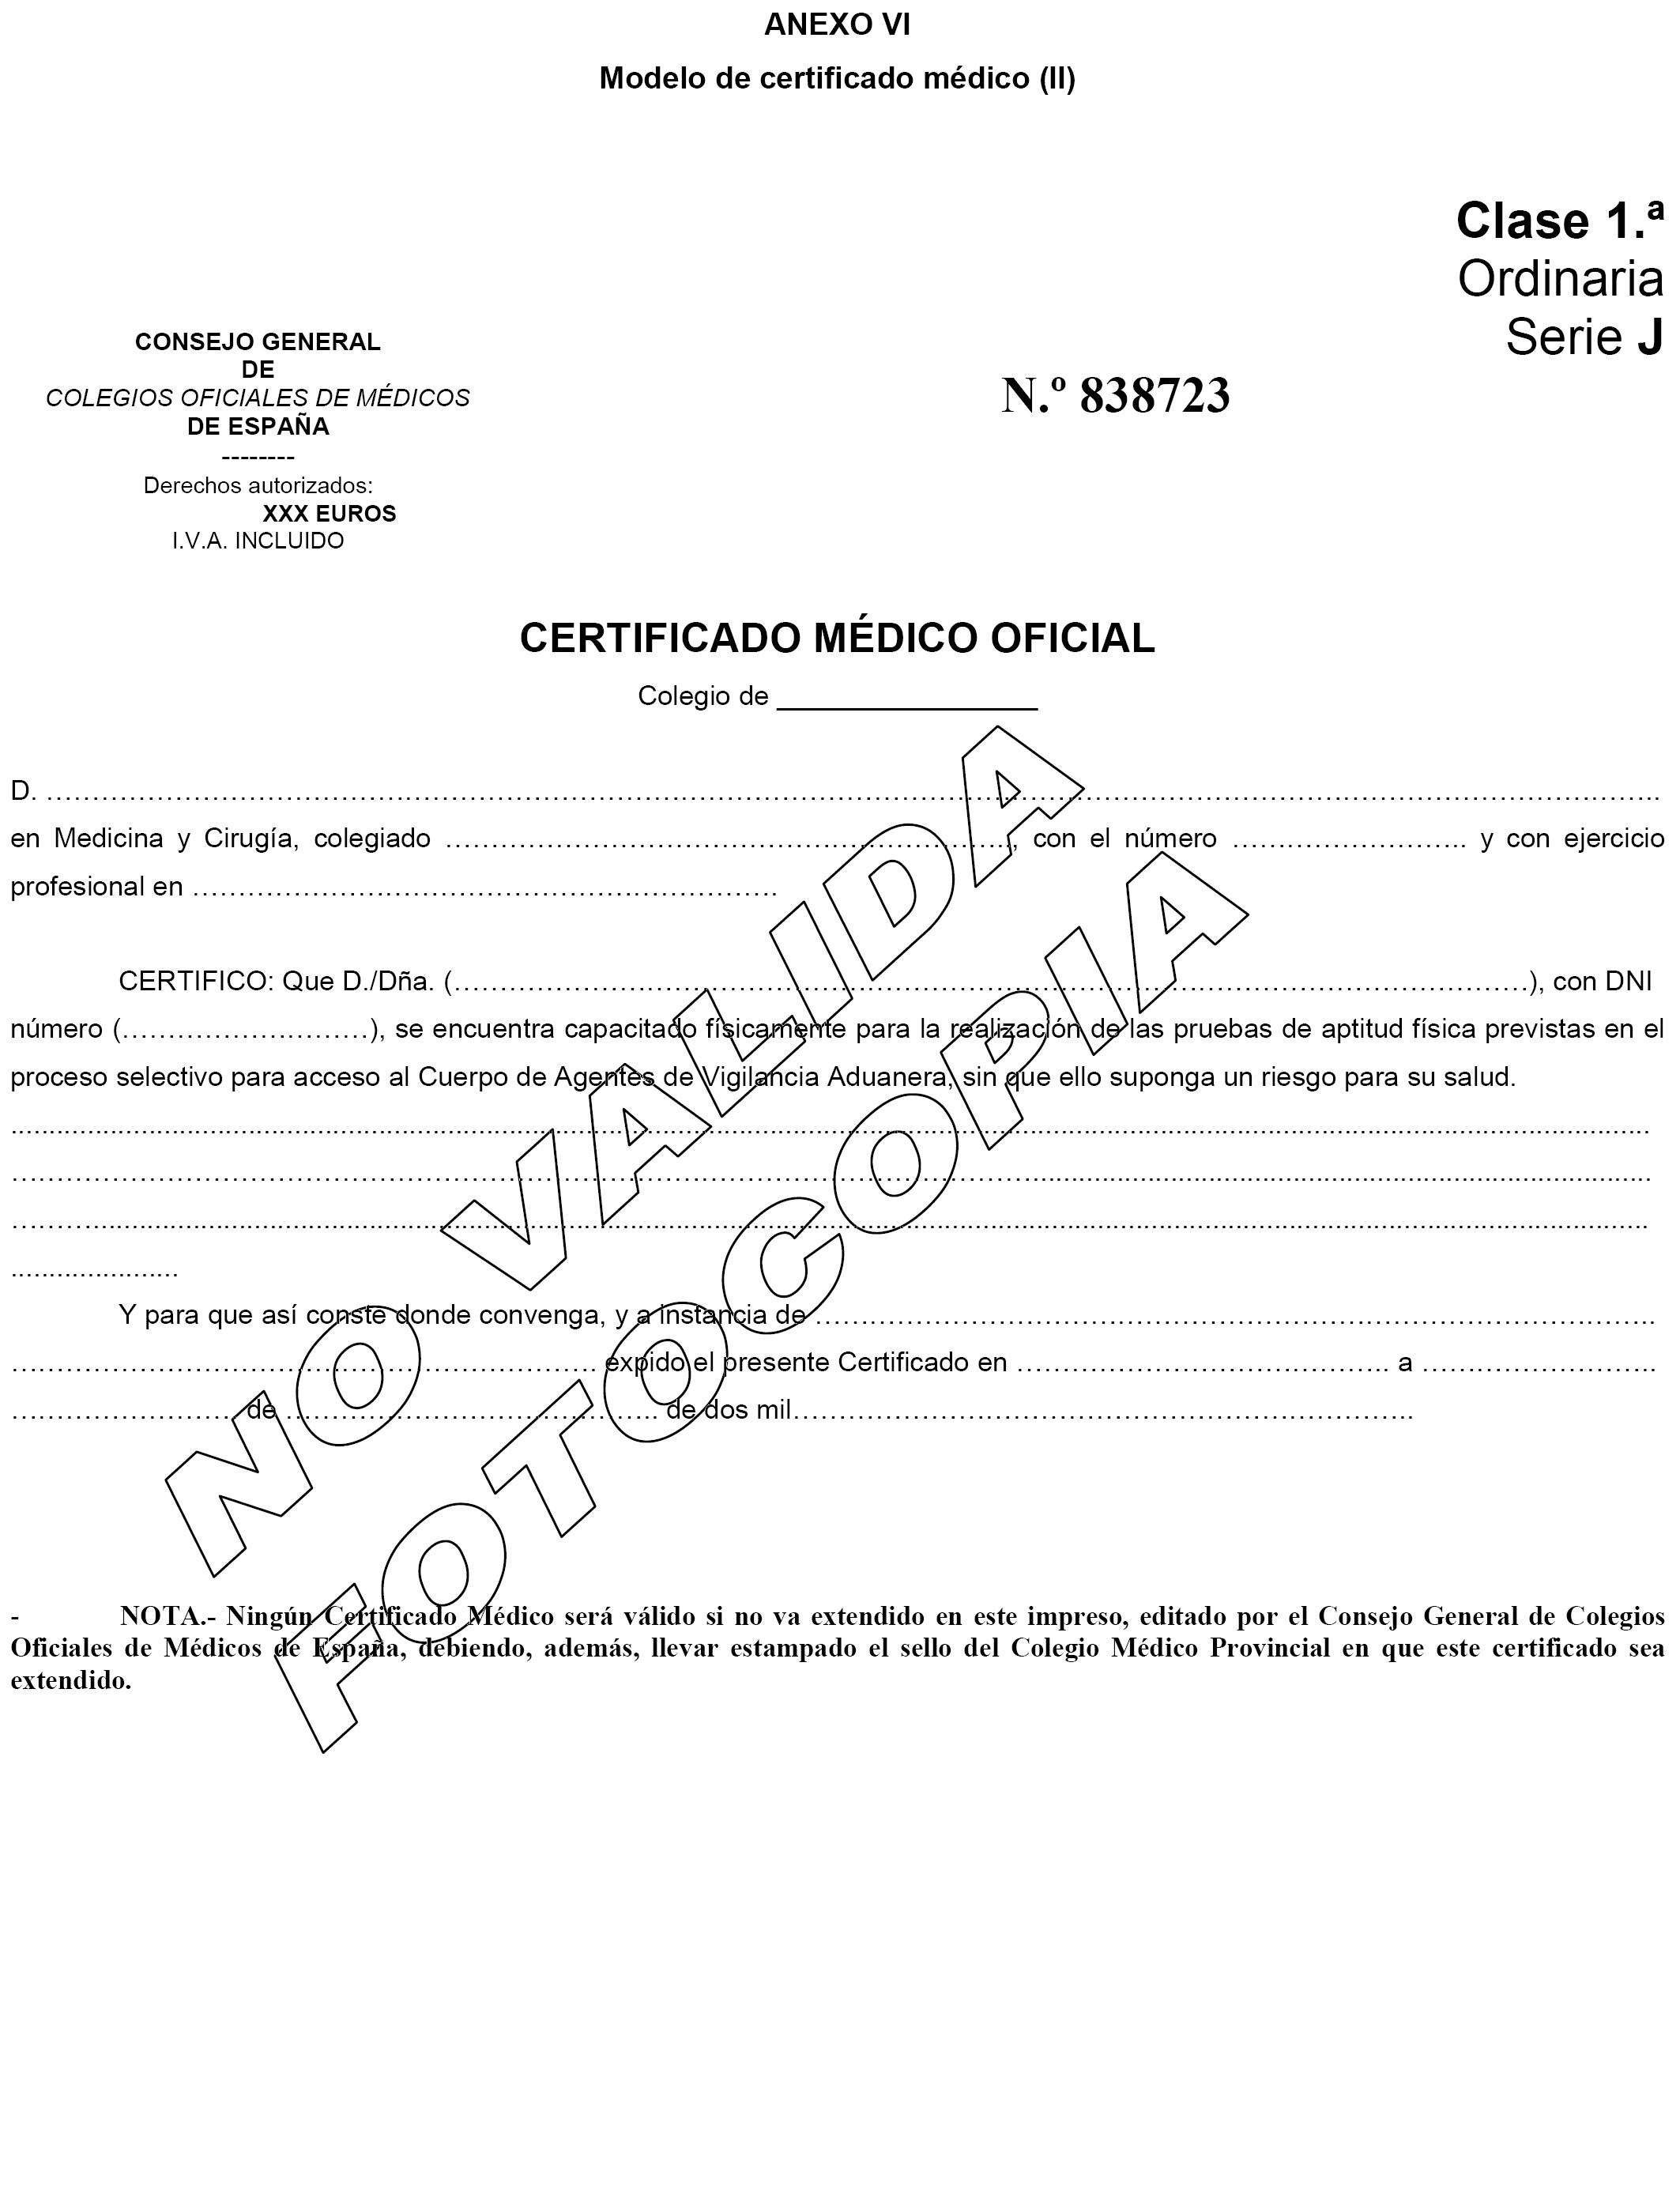 BOE.es - Documento BOE-A-2016-10725